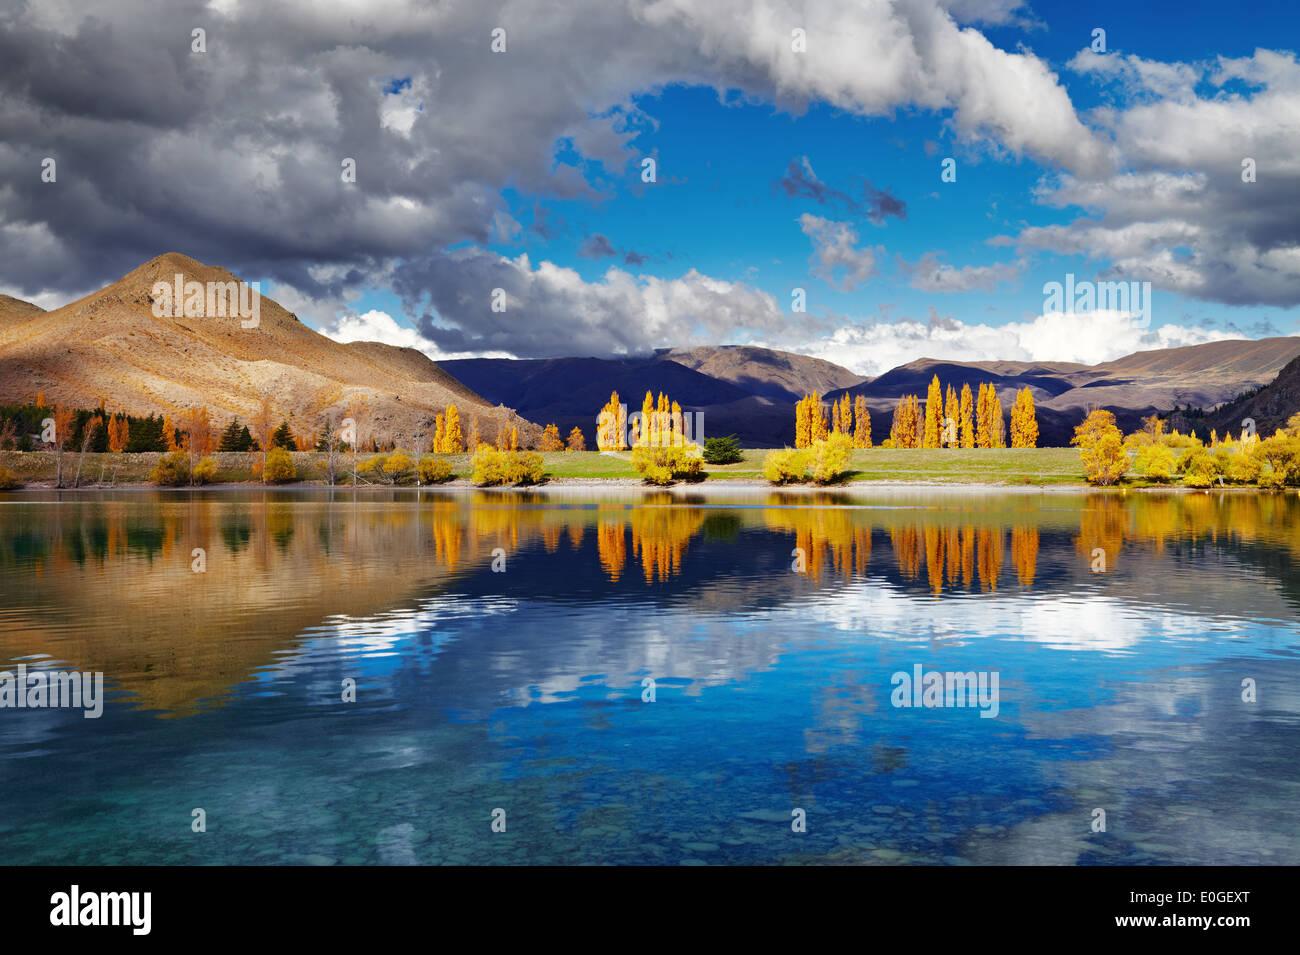 Berglandschaft in herbstlichen Farben, Lake Benmore, Neuseeland Stockbild